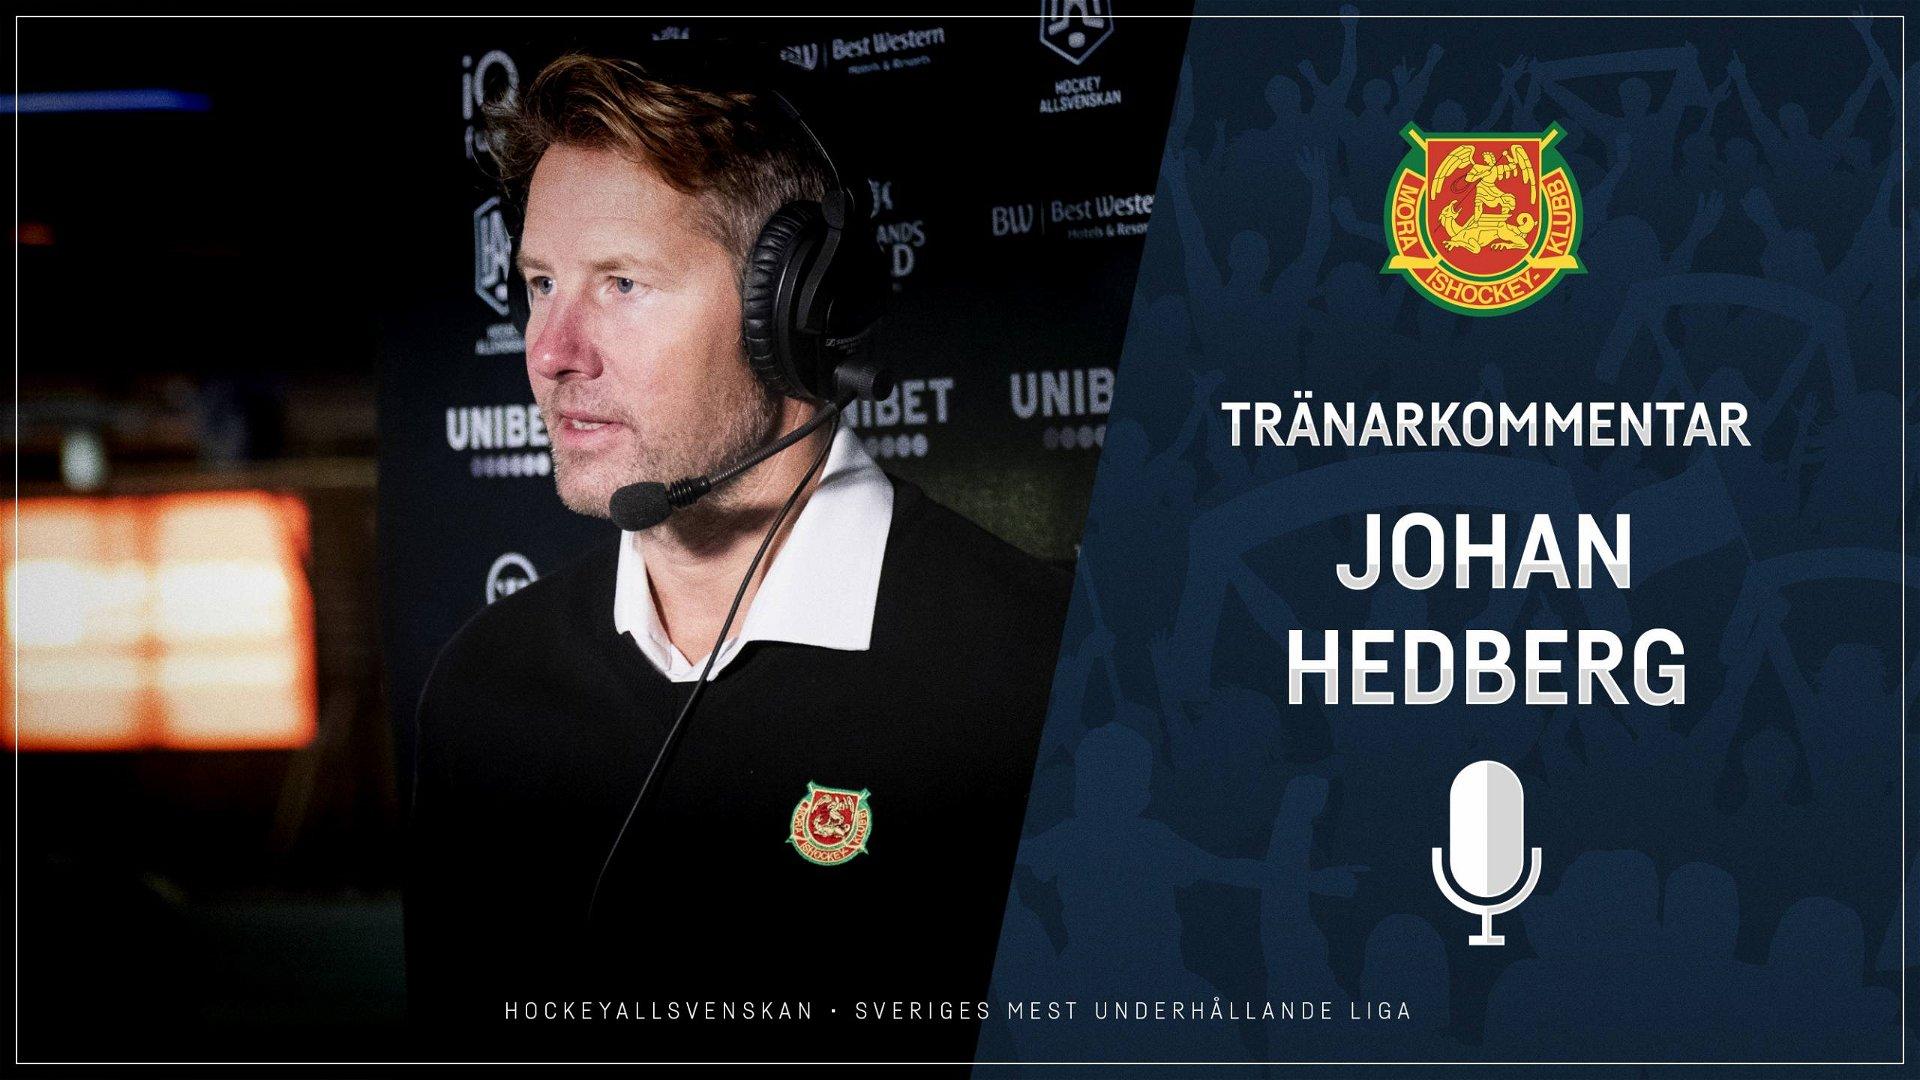 2021-03-05 Segerintervju: Johan Hedberg